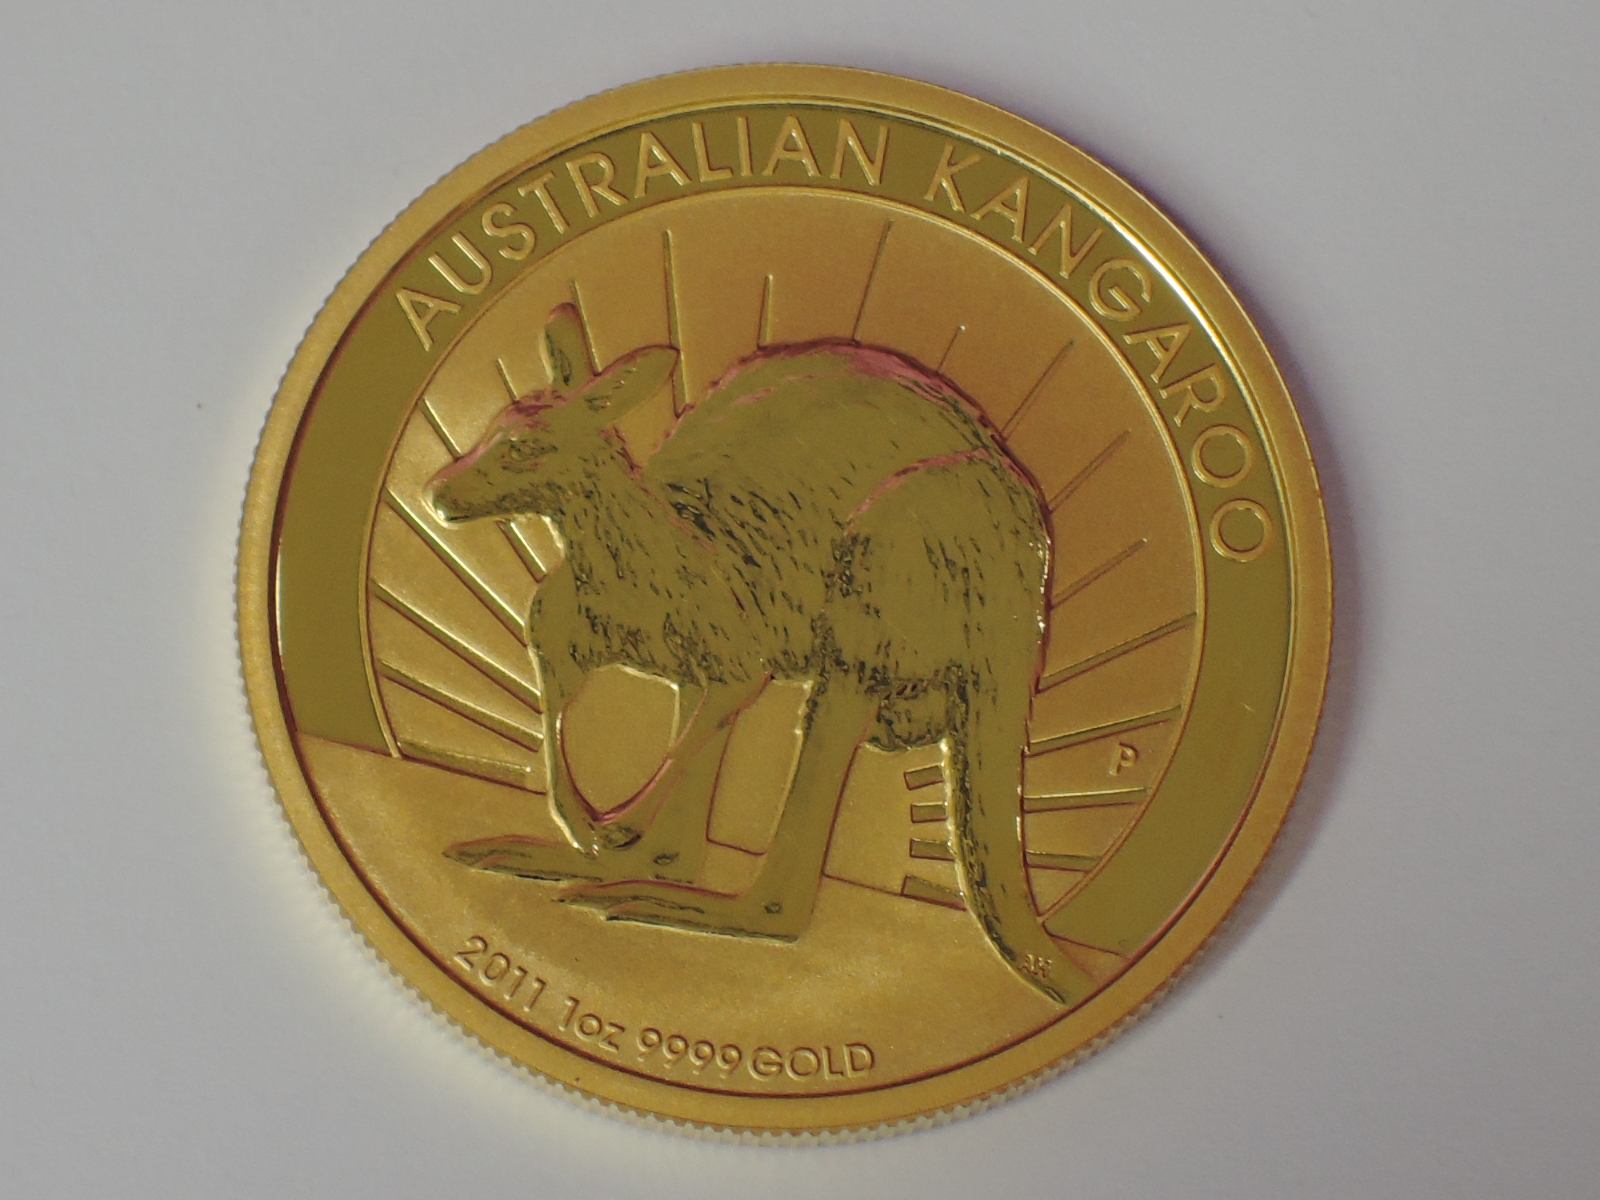 Lot 604 - A gold 1oz 2011 100 dollar Australian Kangaroo coin, in plastic case